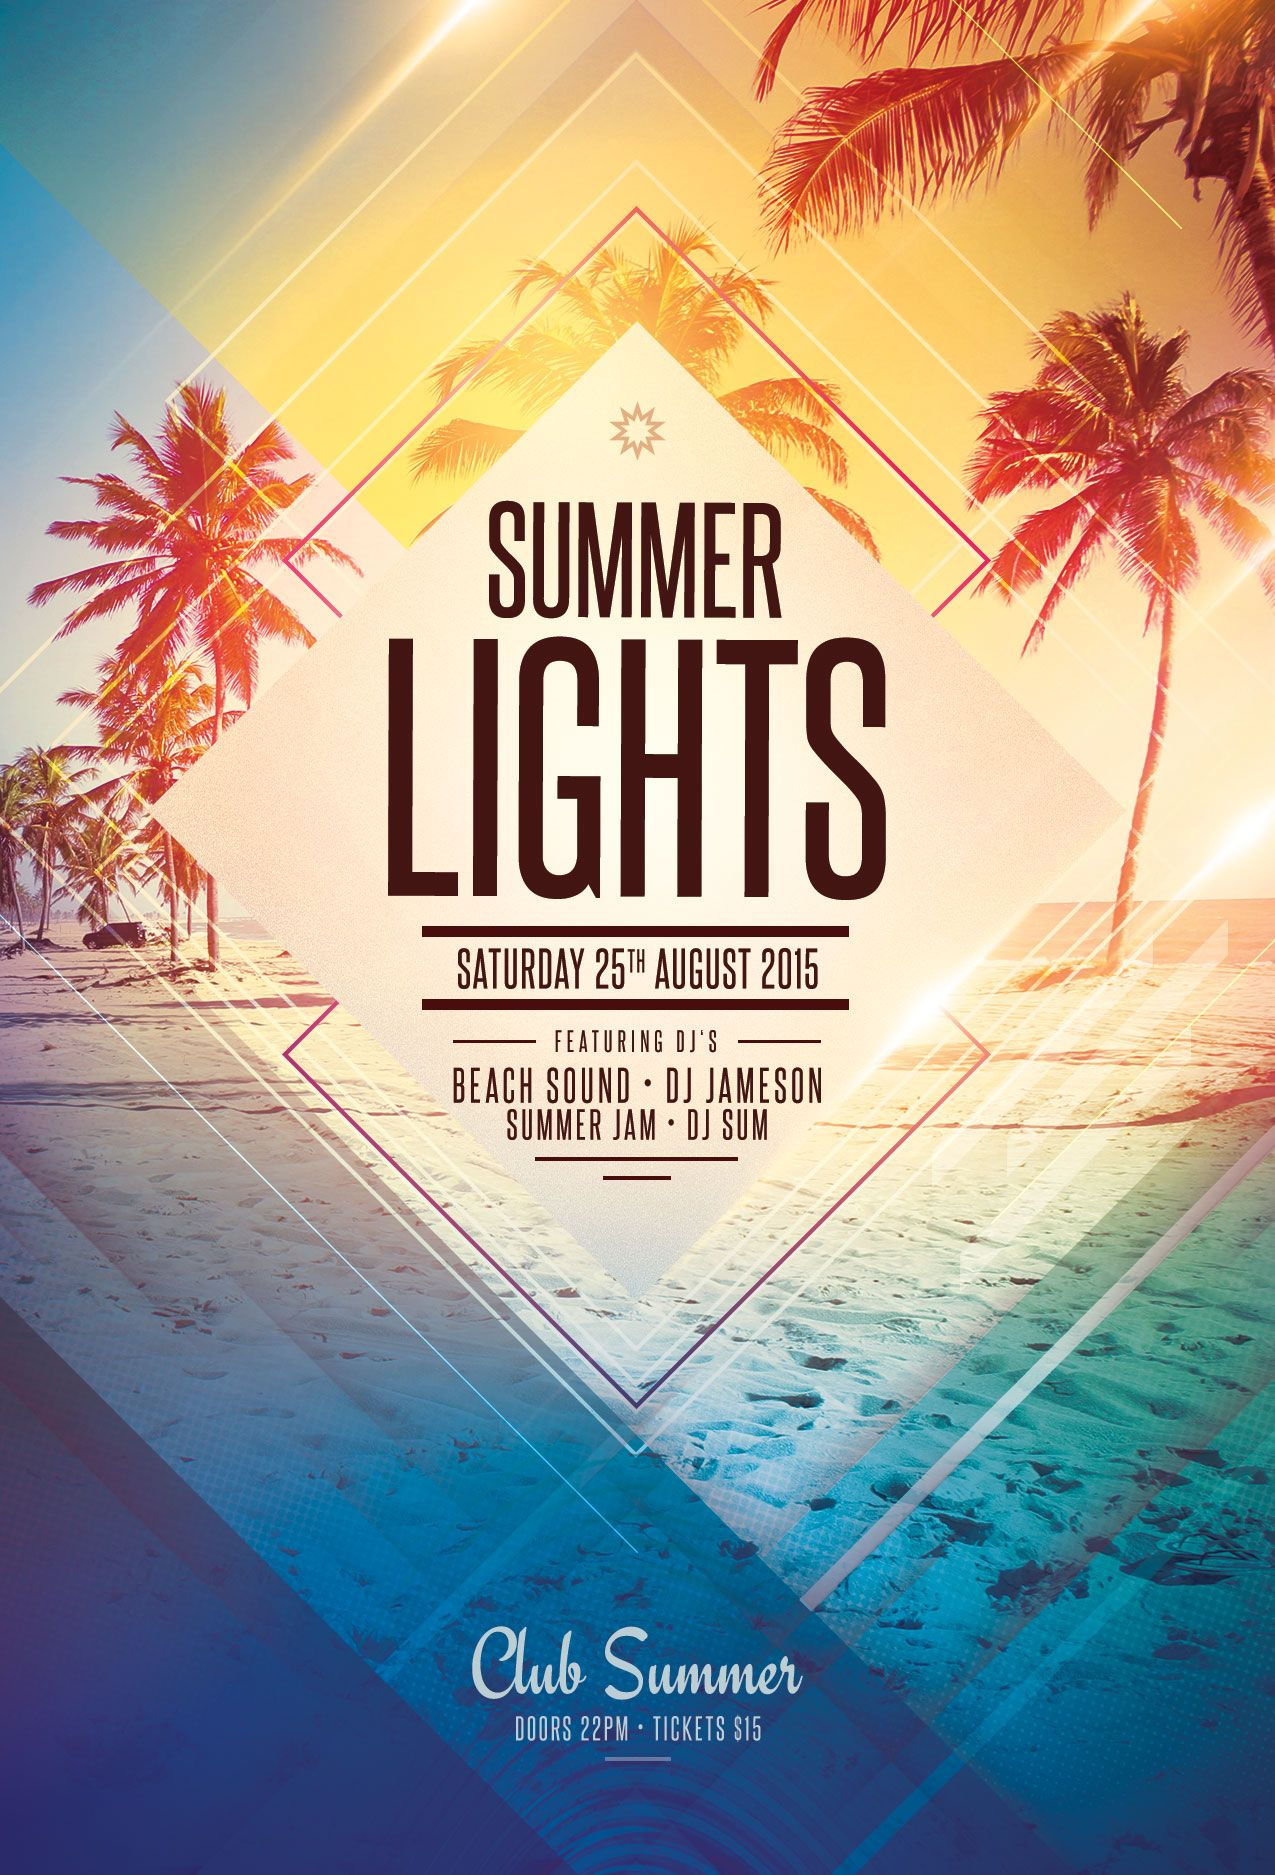 Poster design template psd - Summer Lights Flyer Template Download Psd File 9